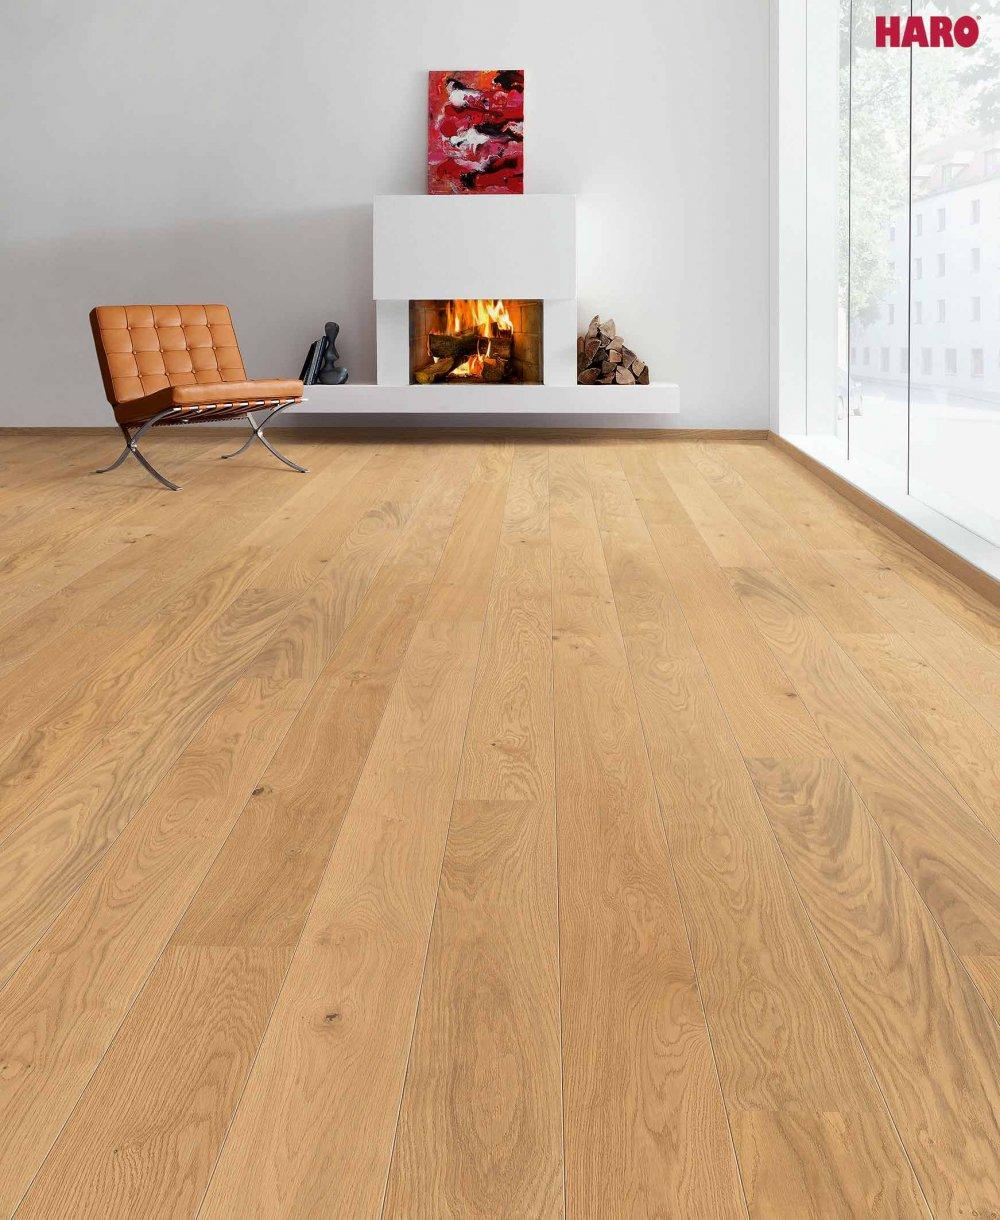 535447 haro parkett landhausdiele 4000 eiche markant natur strukturiert 2v fase naturadur lackiert. Black Bedroom Furniture Sets. Home Design Ideas